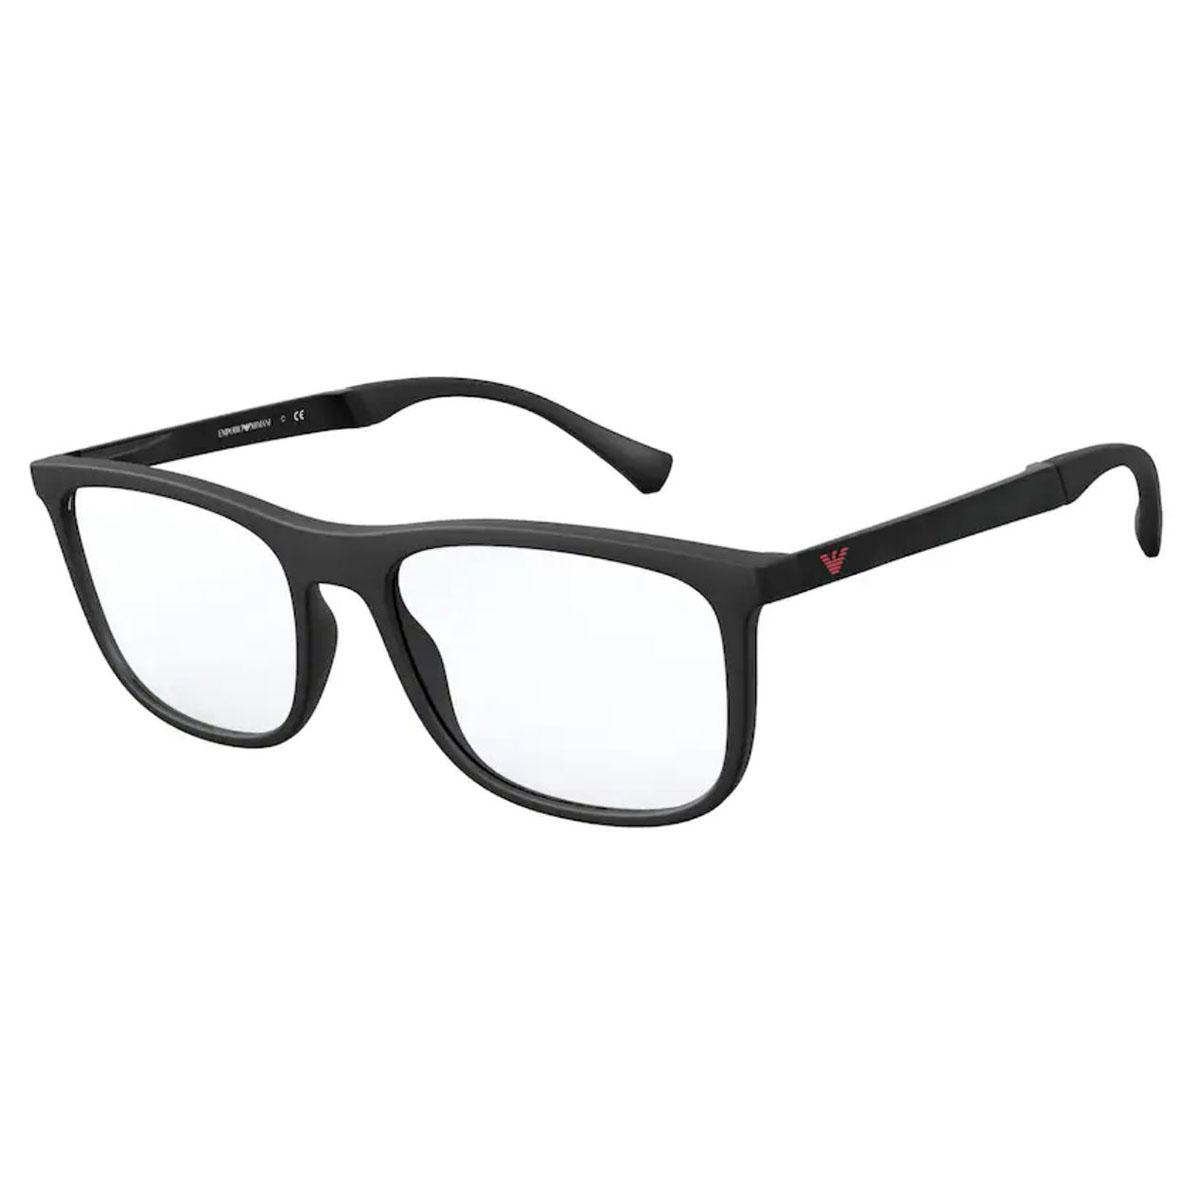 Óculos de Grau Empório Armani EA3170 Preto Fosco Quadrado